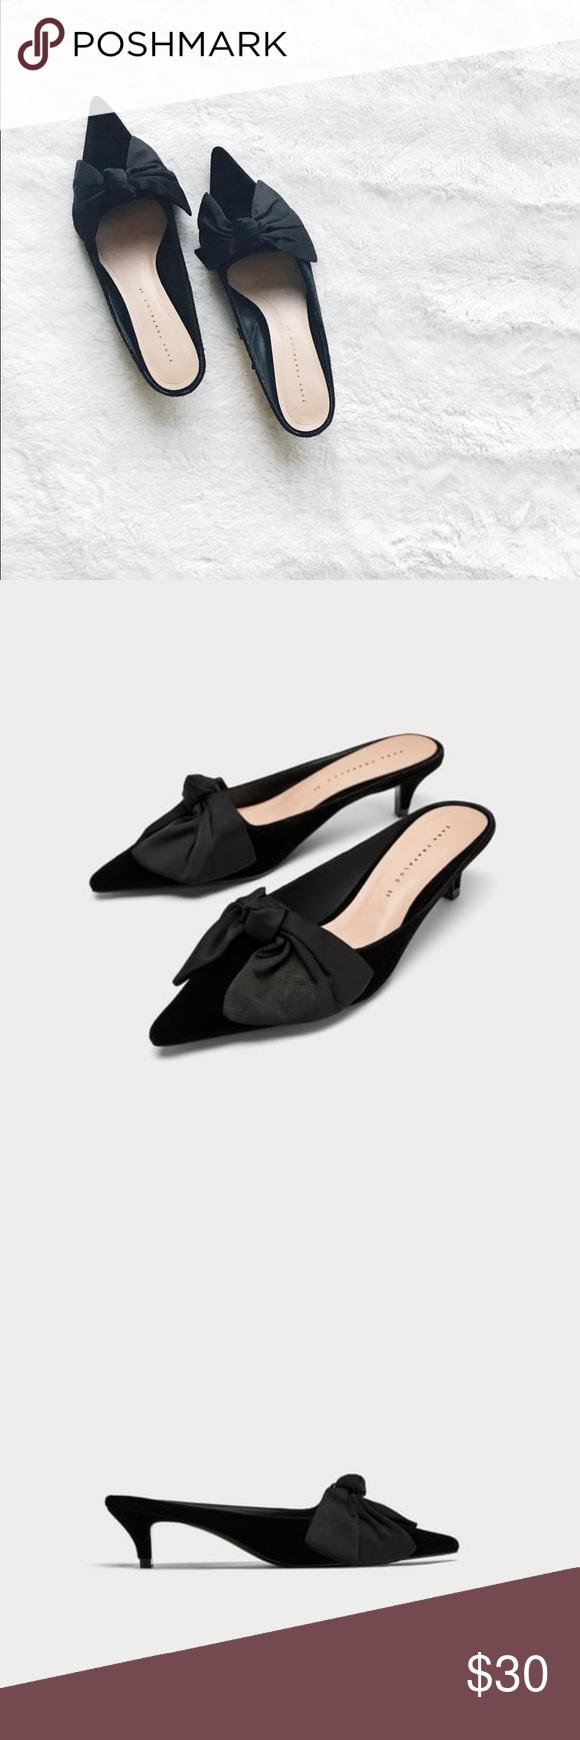 Brand New Zara Kitten Heel Mules With Bow Kitten Heels Heels Heeled Mules